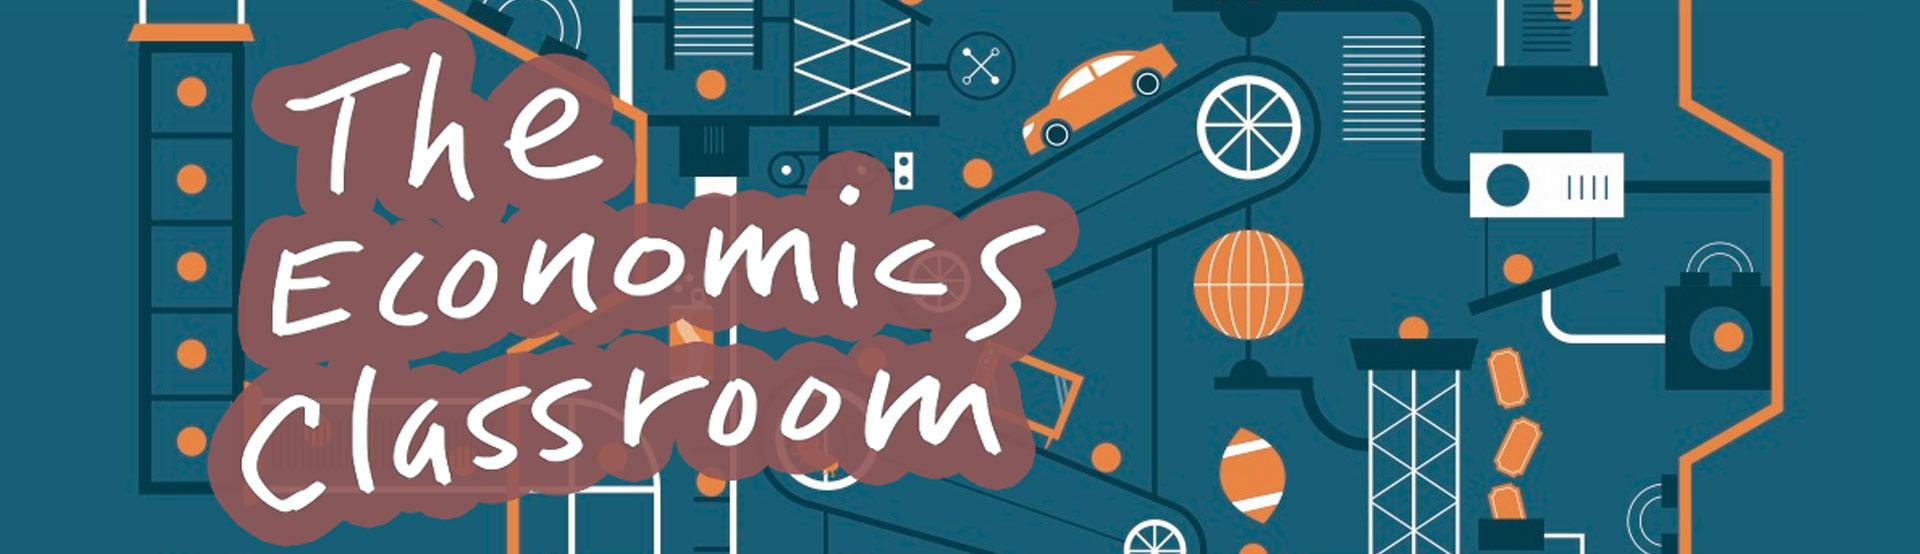 The Economics Classroom